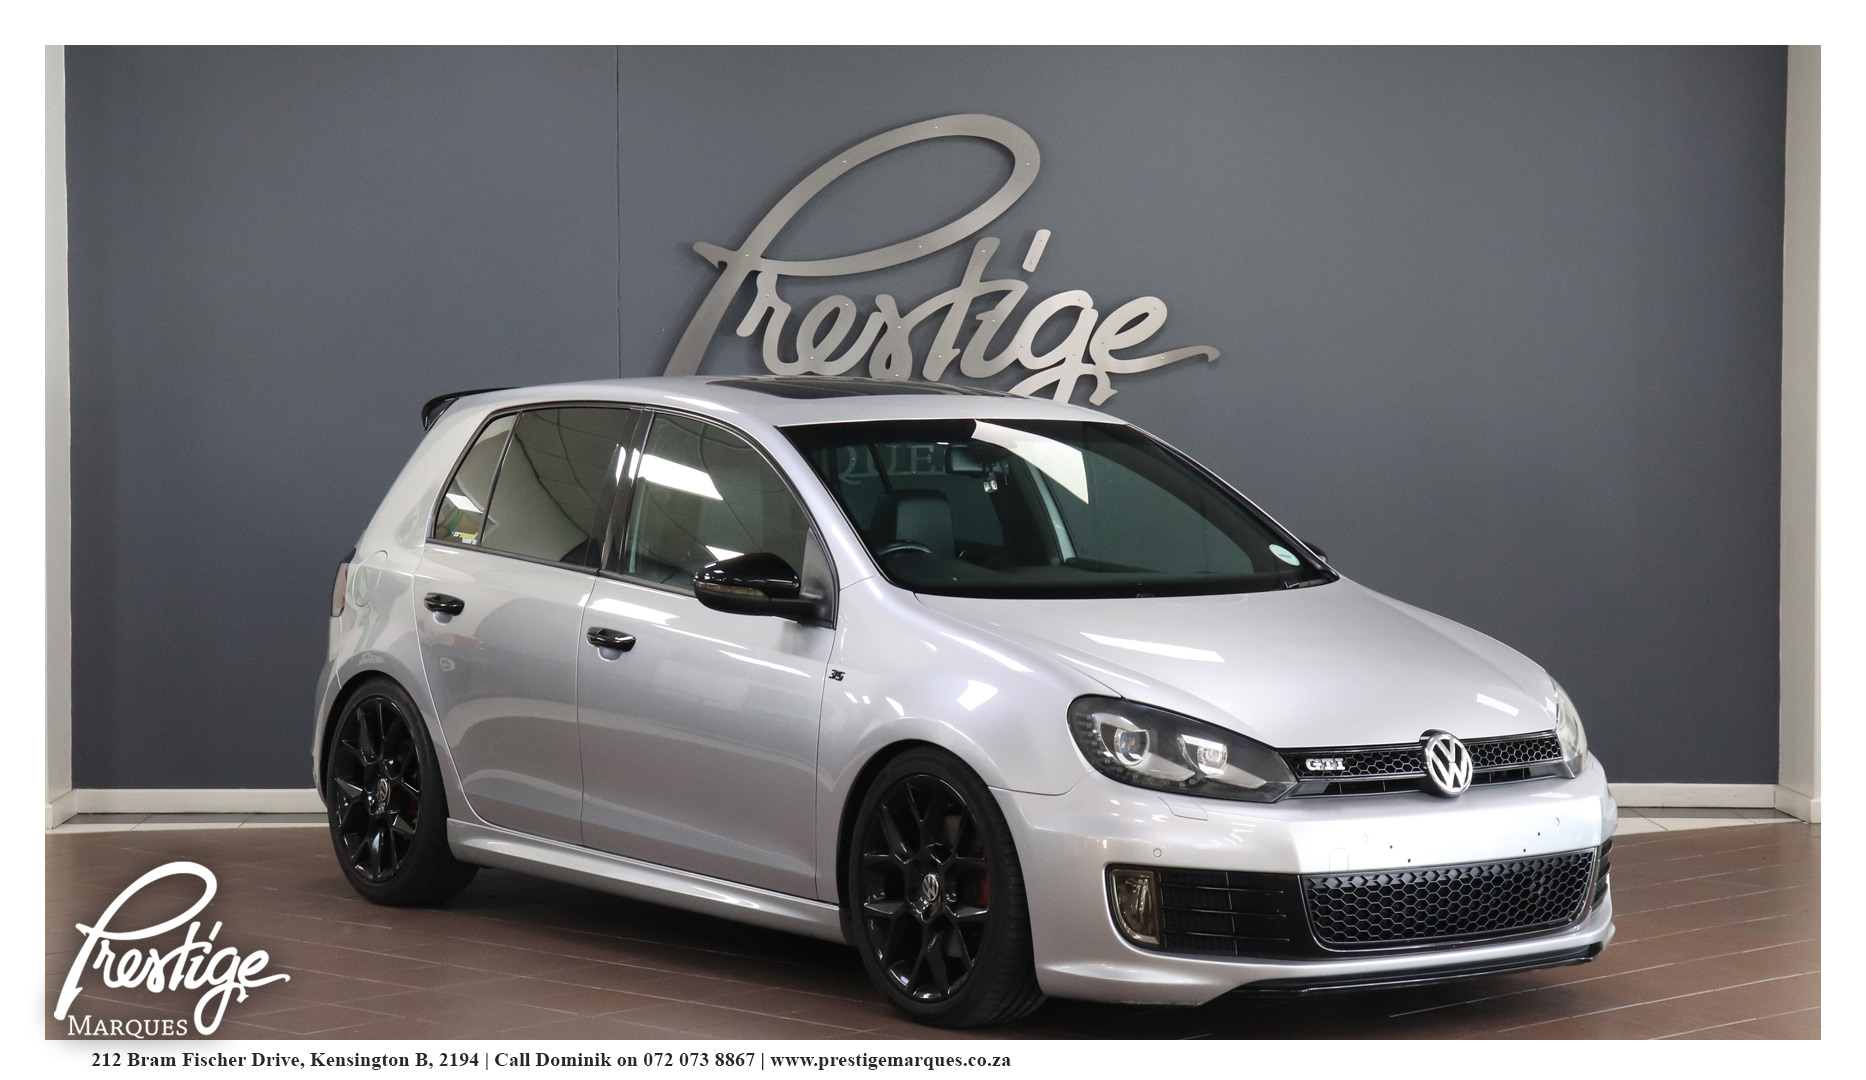 2013-Volkswagen-Golf-GTI-Ed 35-DSG-Prestige-Marques-Randburg-Sandton-1